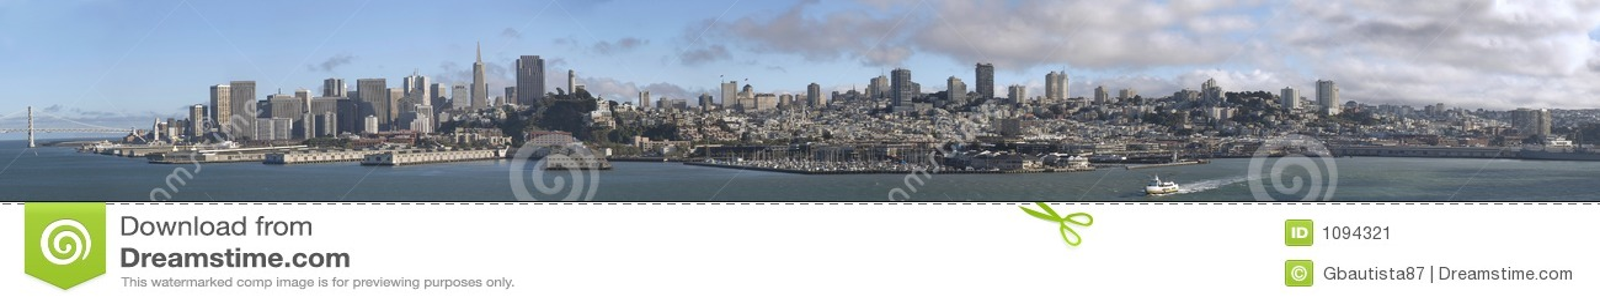 Het Panorama van San Francisco